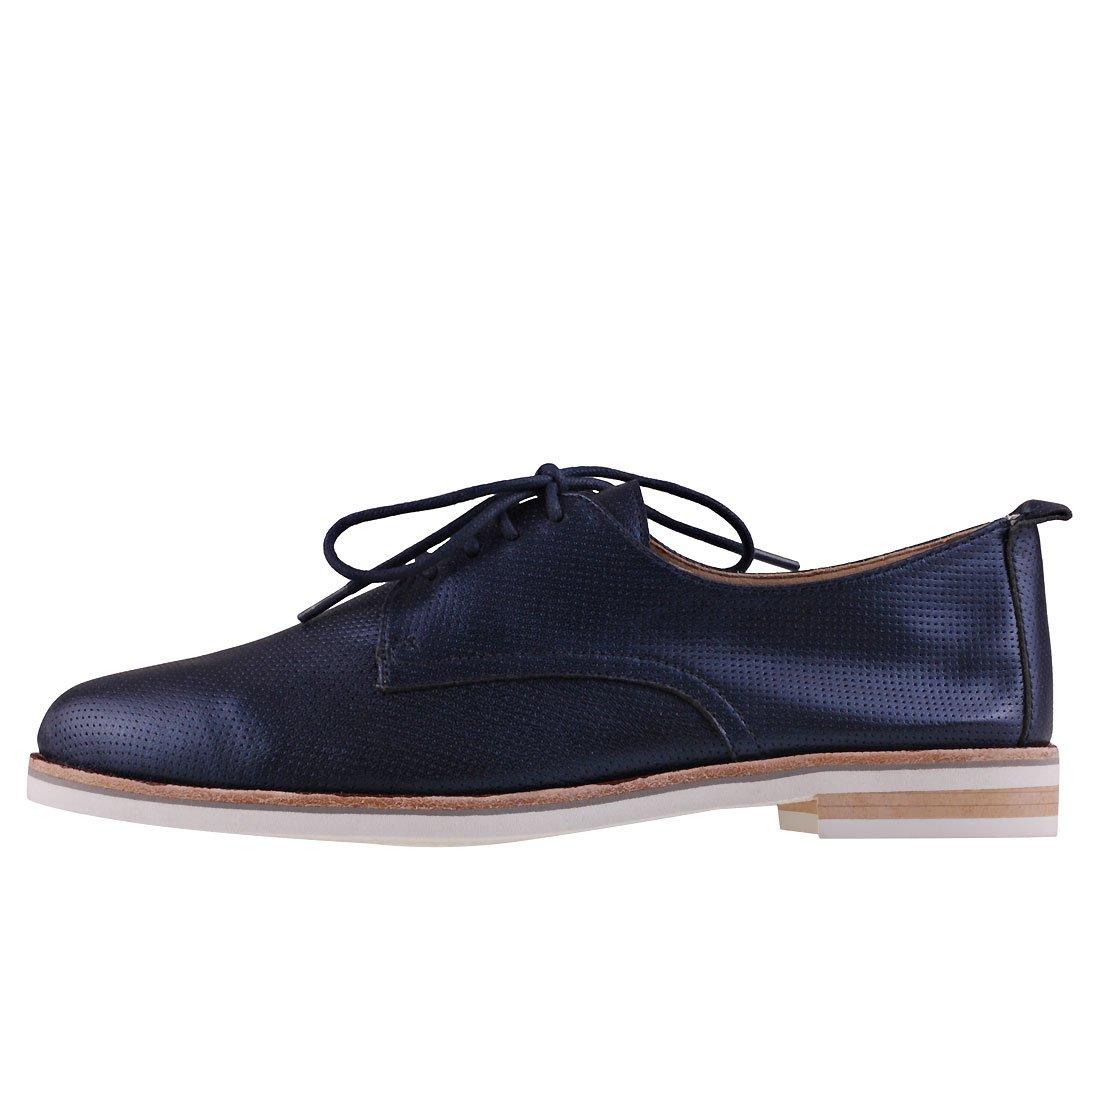 Caprice Schuhe Damen Echtleder-Halbschuhe Damen Schuhe Schnürschuhe Navy Blau 476d45